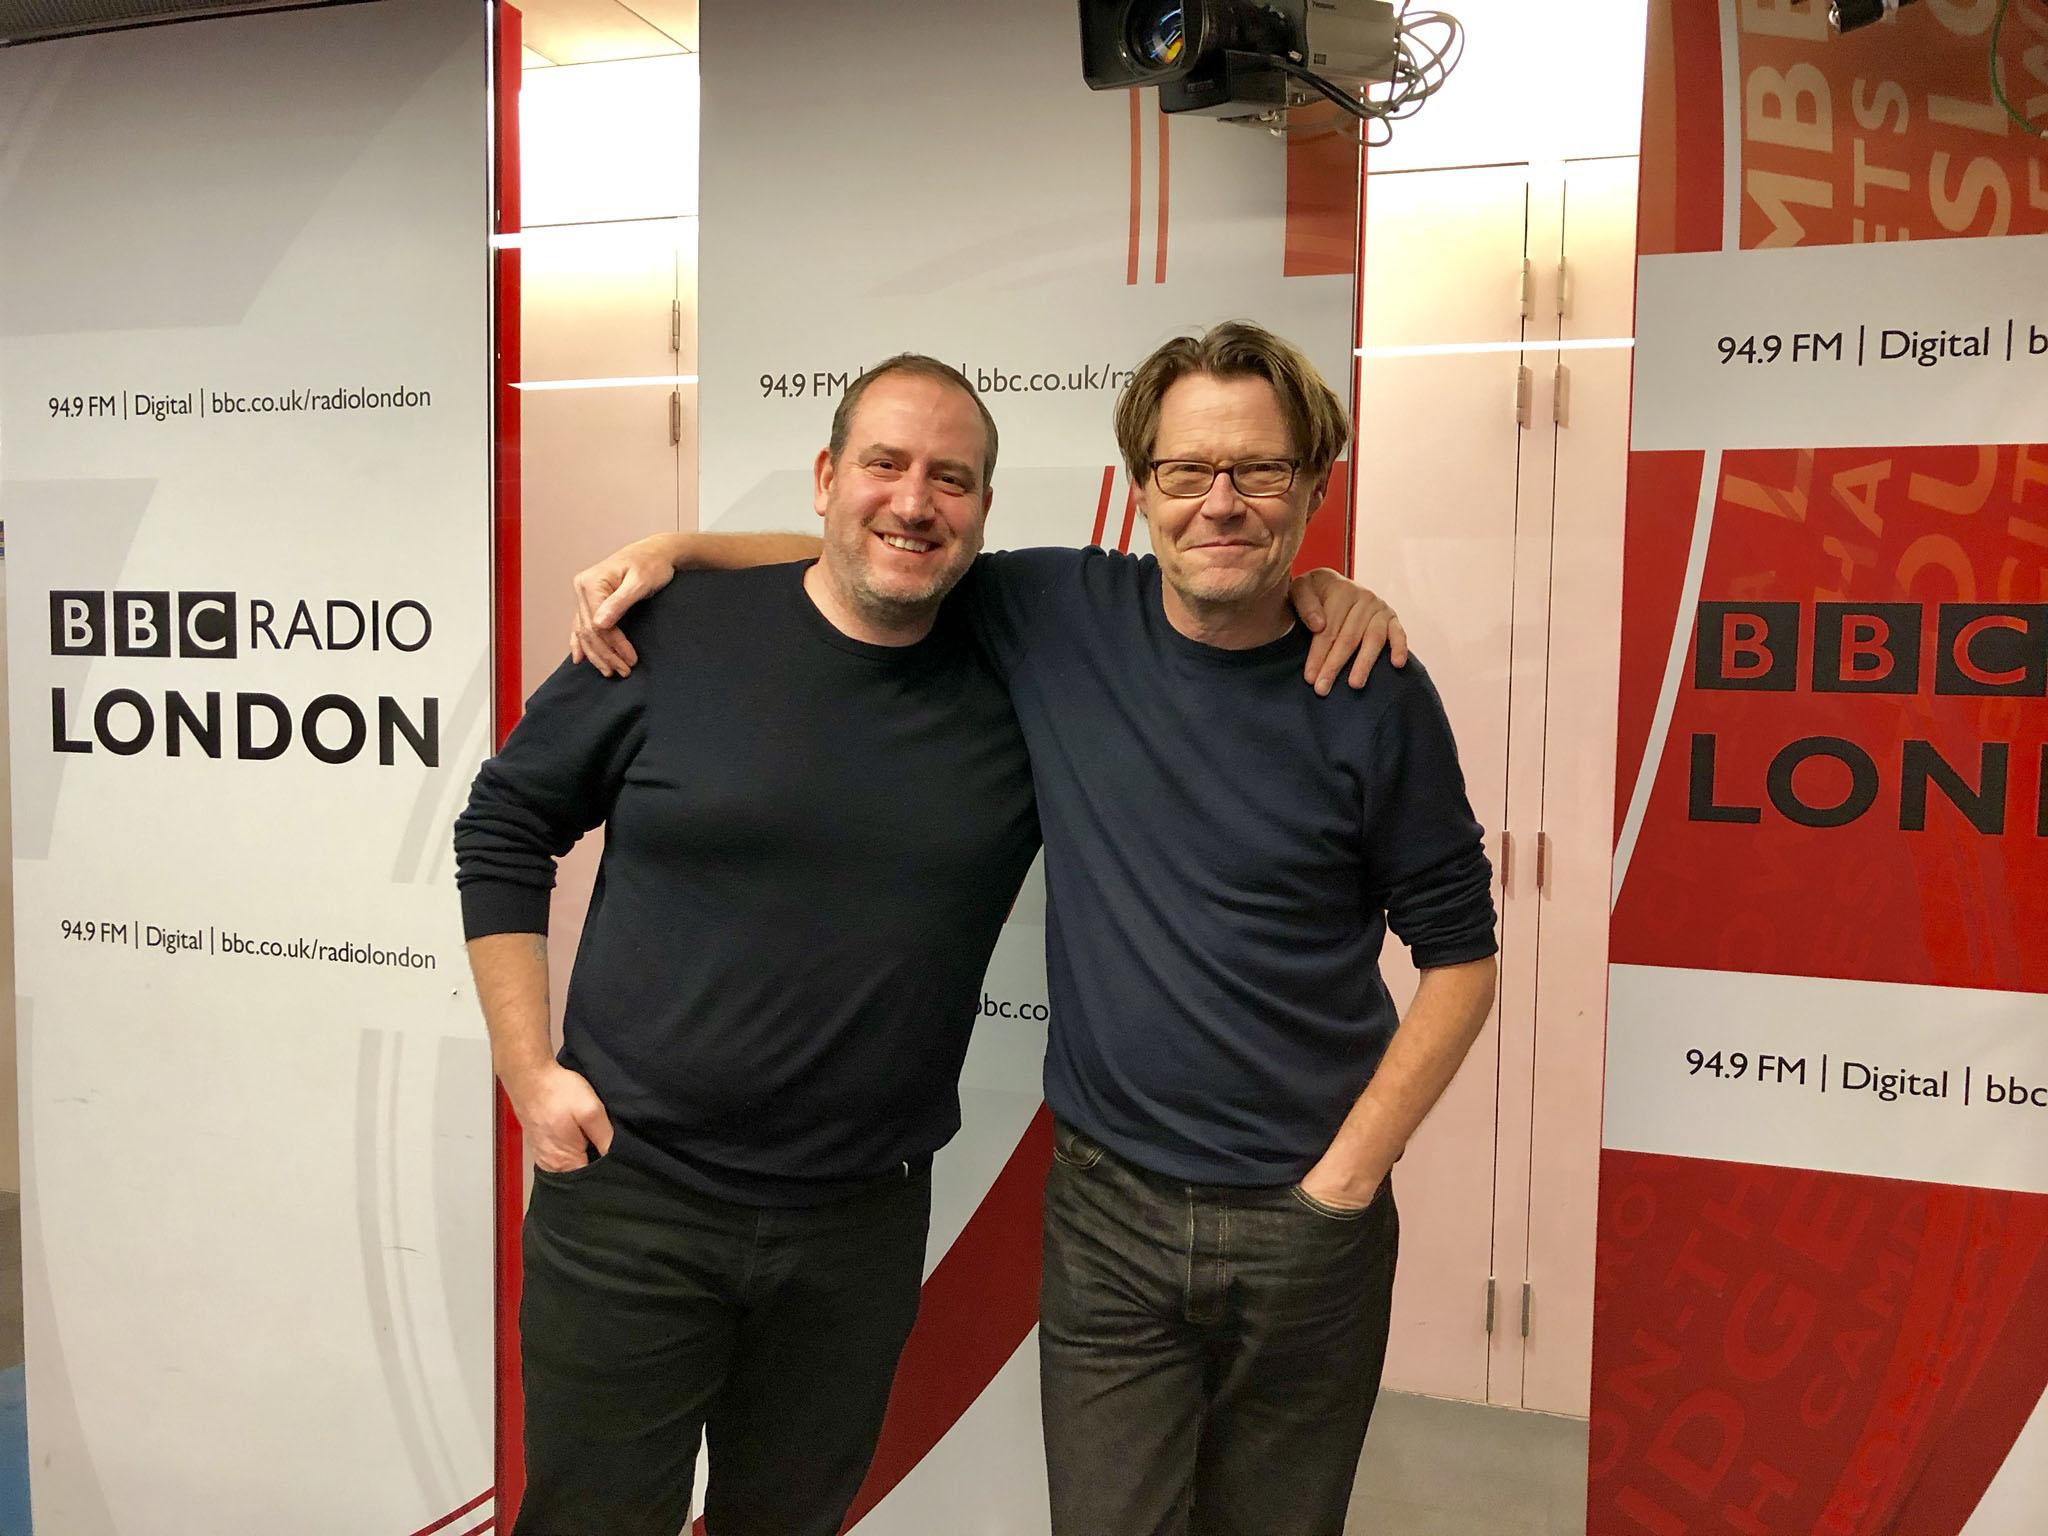 Simon_Boyle_Robert_Elms_BBC_Radio_London.jpg